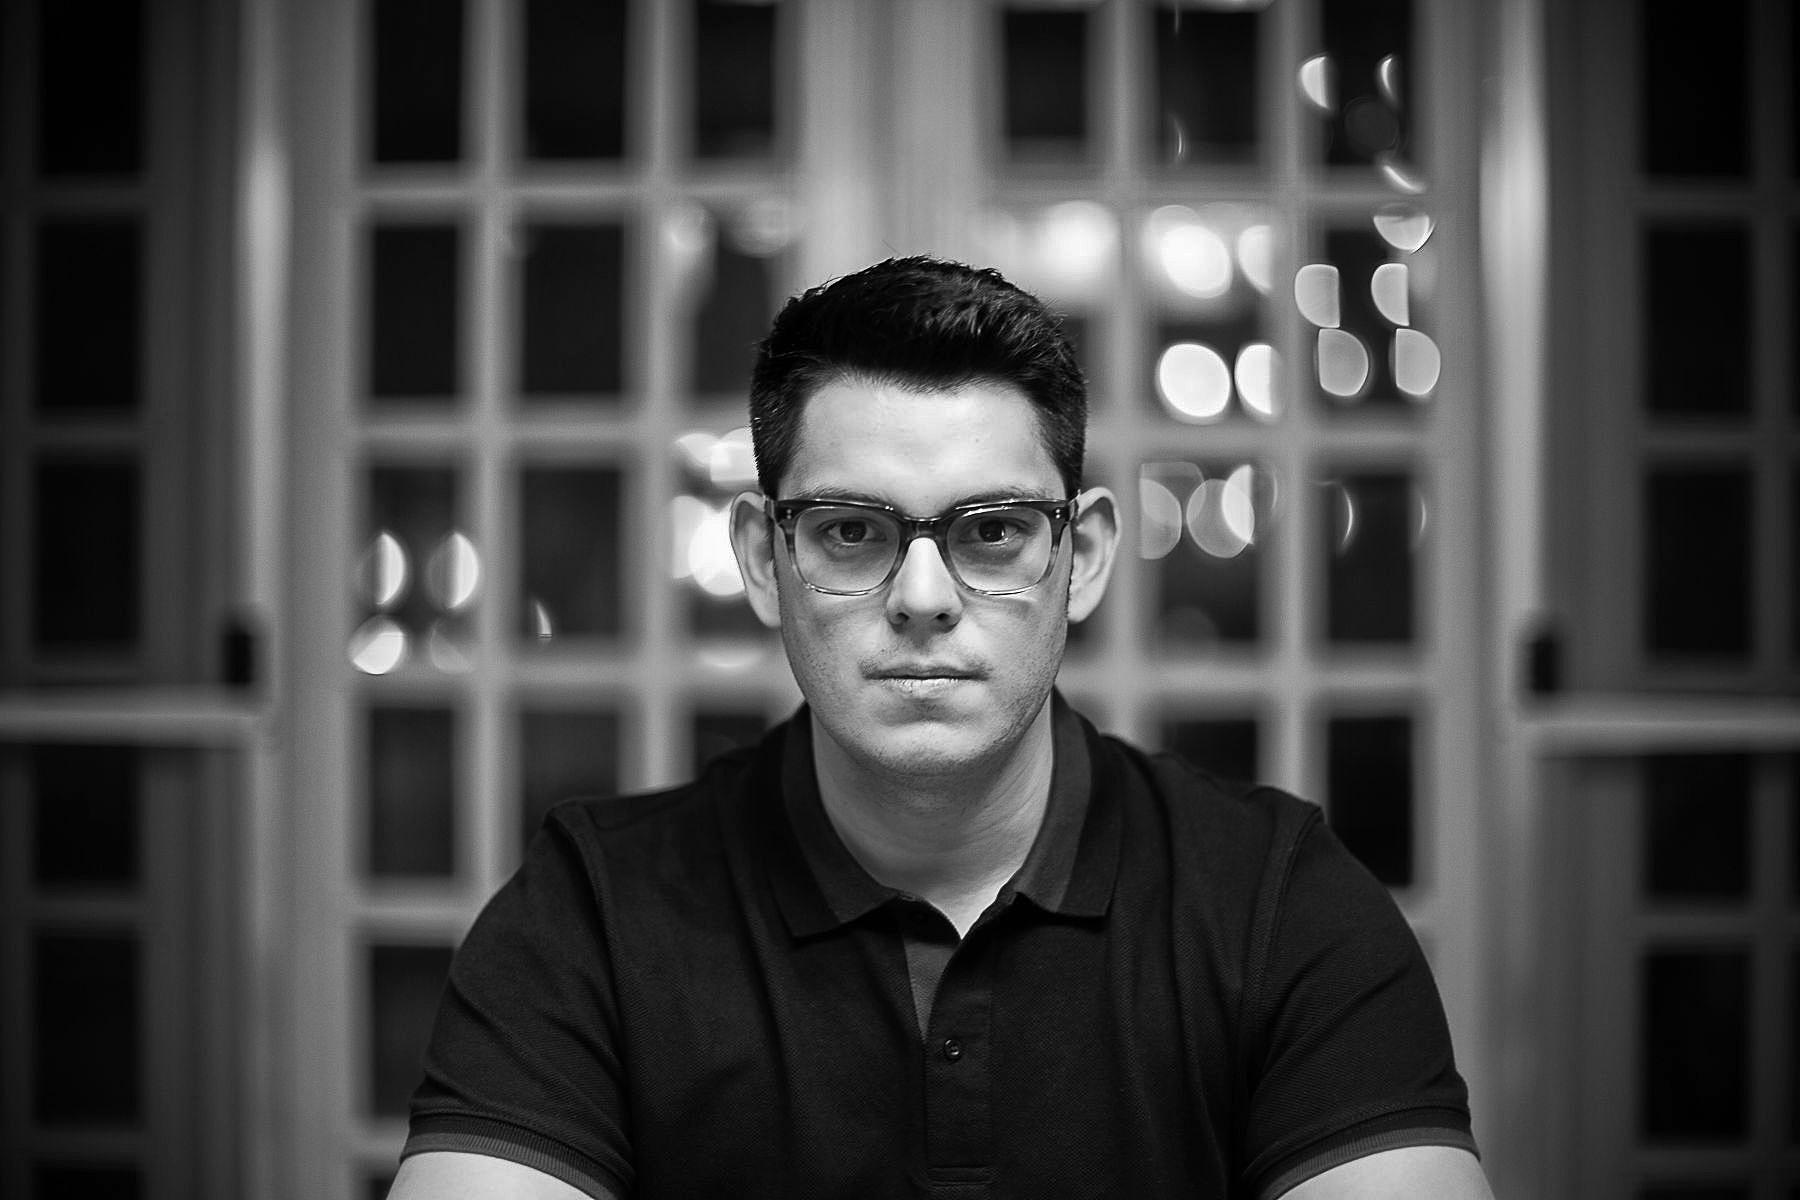 Richard Gutierrez, Straight Portrait